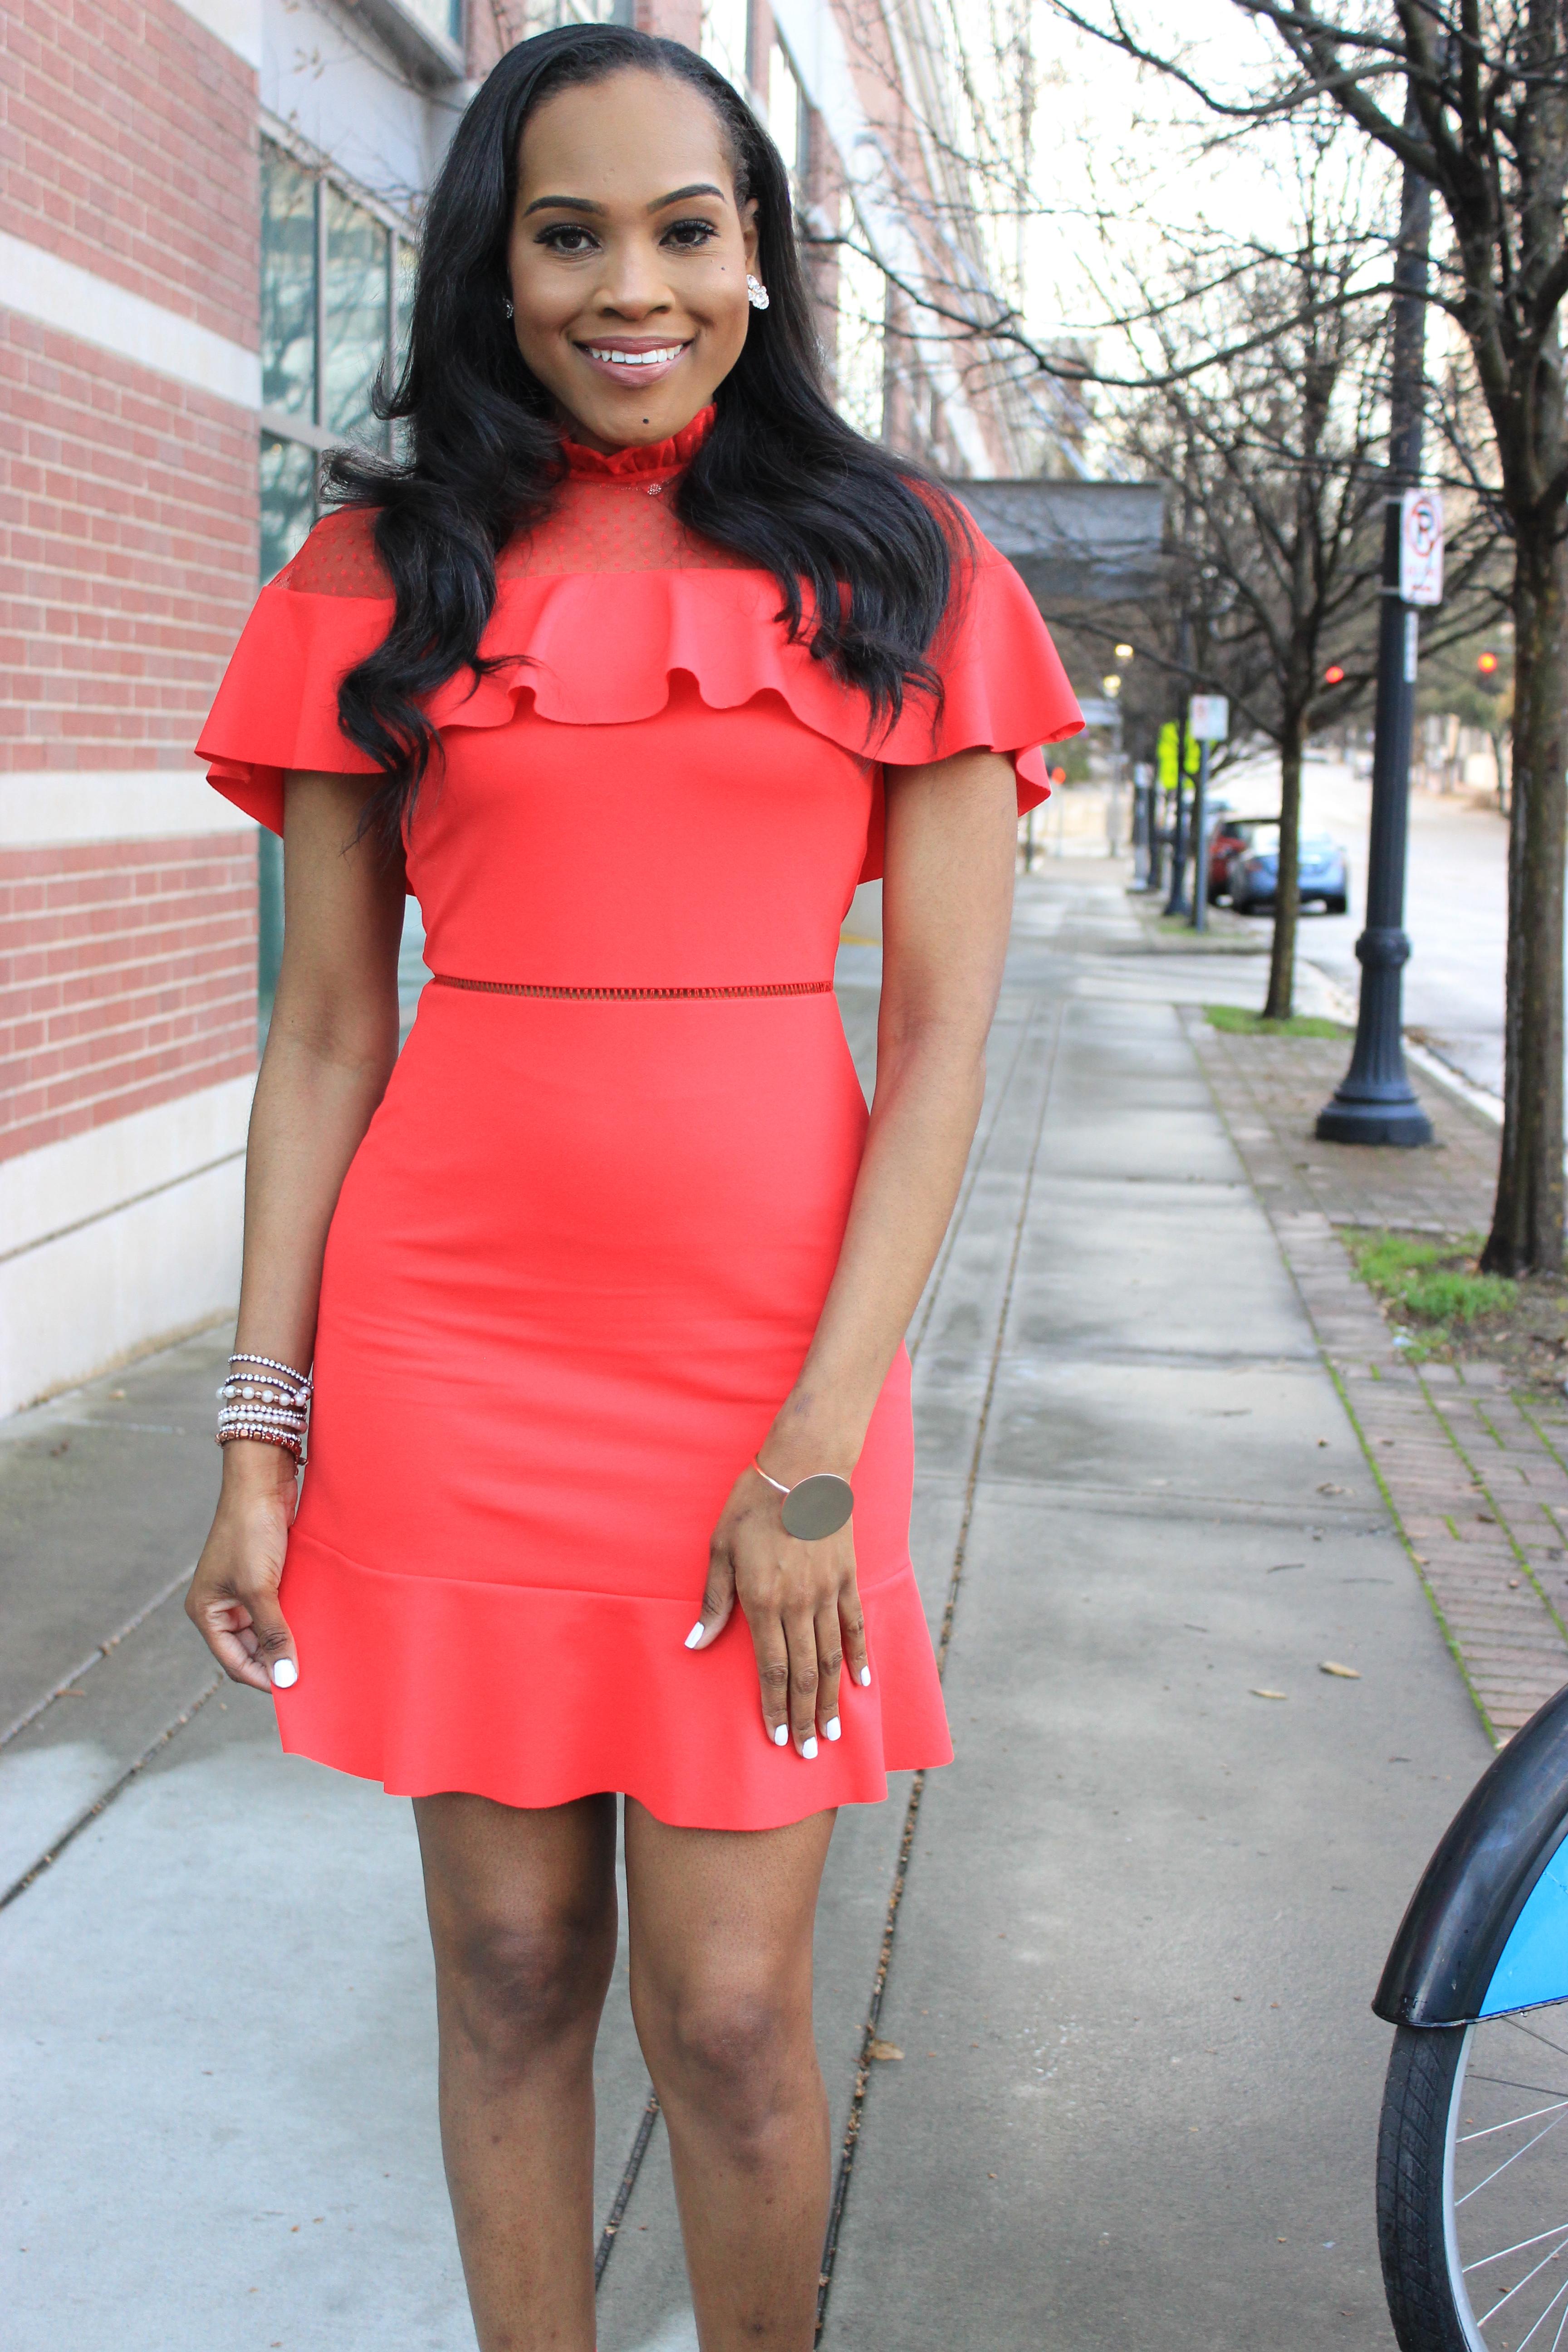 Style-files-Asos-Skater-Dress-with-Dobby-mesh-panel-red-skater-dress-asos-red-skater-dress-red-fringe-justfab-heels-justfab-red-tayrey-heel-sandals-oohlalablog-6